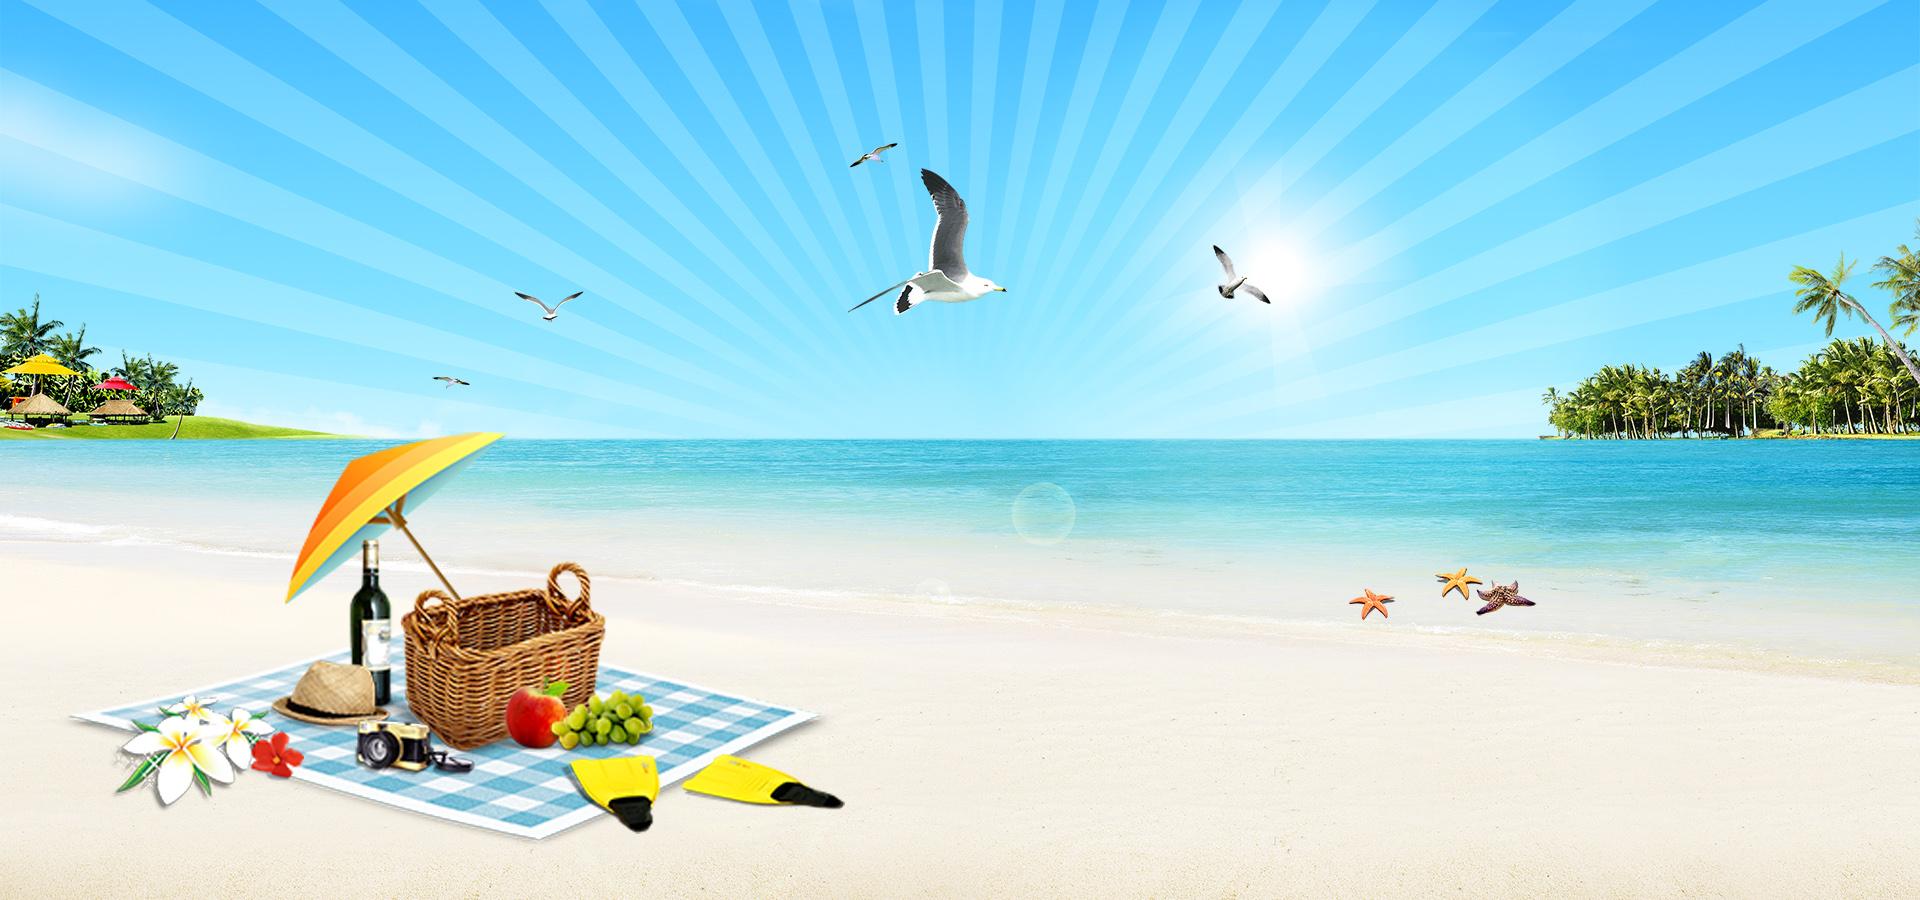 beach party sandy beach seaside sea background image